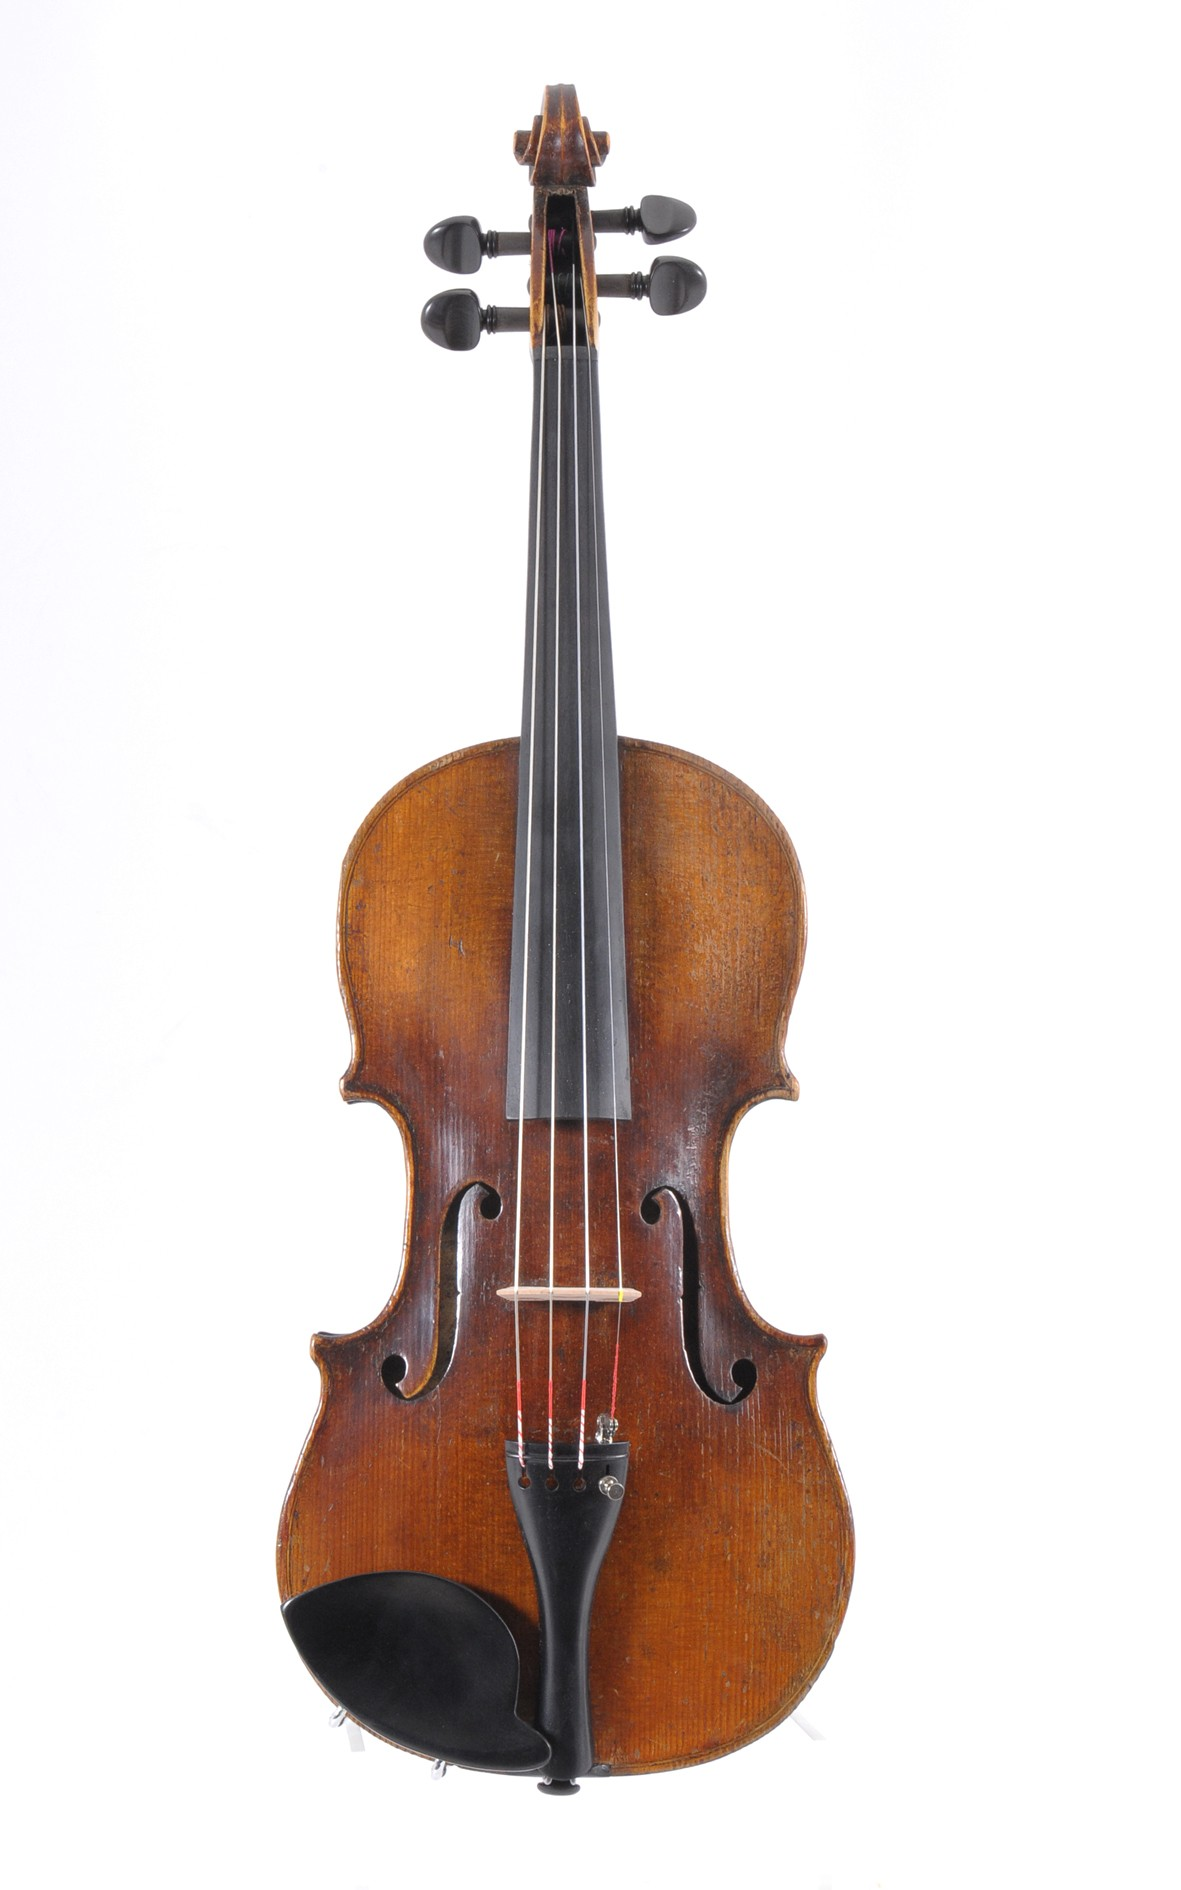 Hopf violin